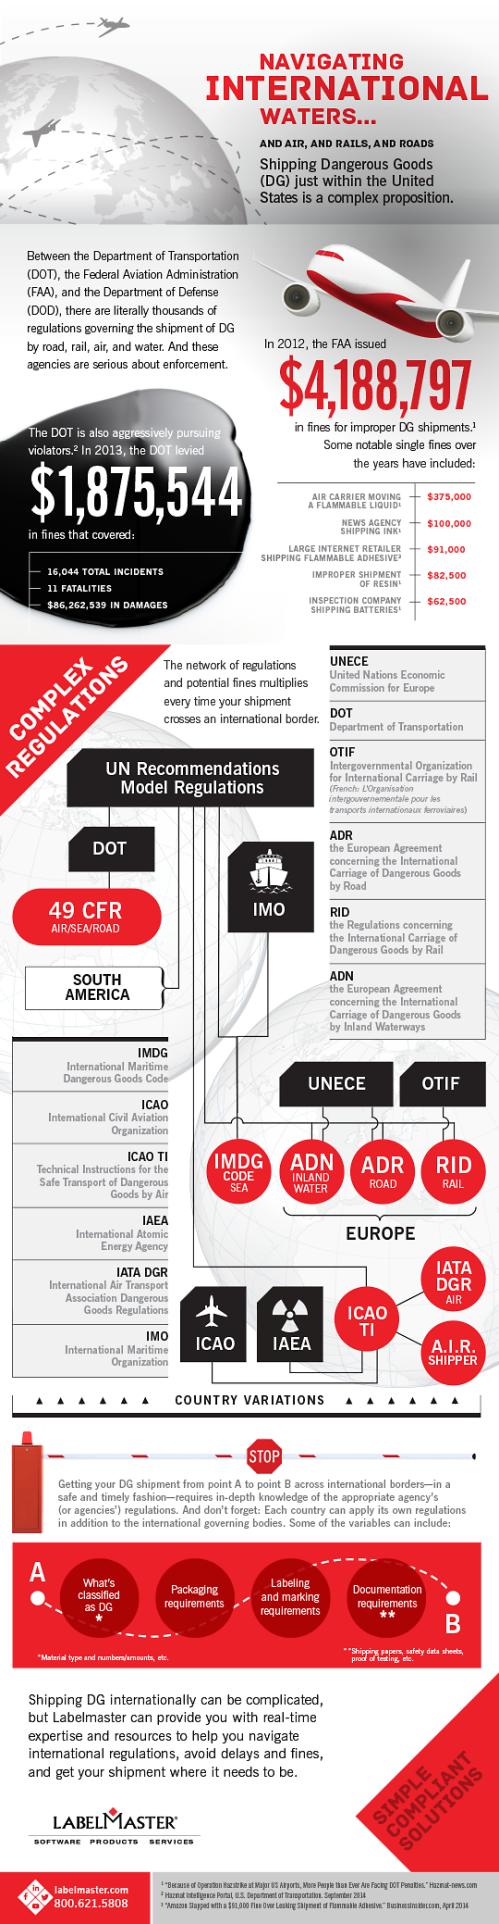 international_shipping_infographic_labelmaster_540